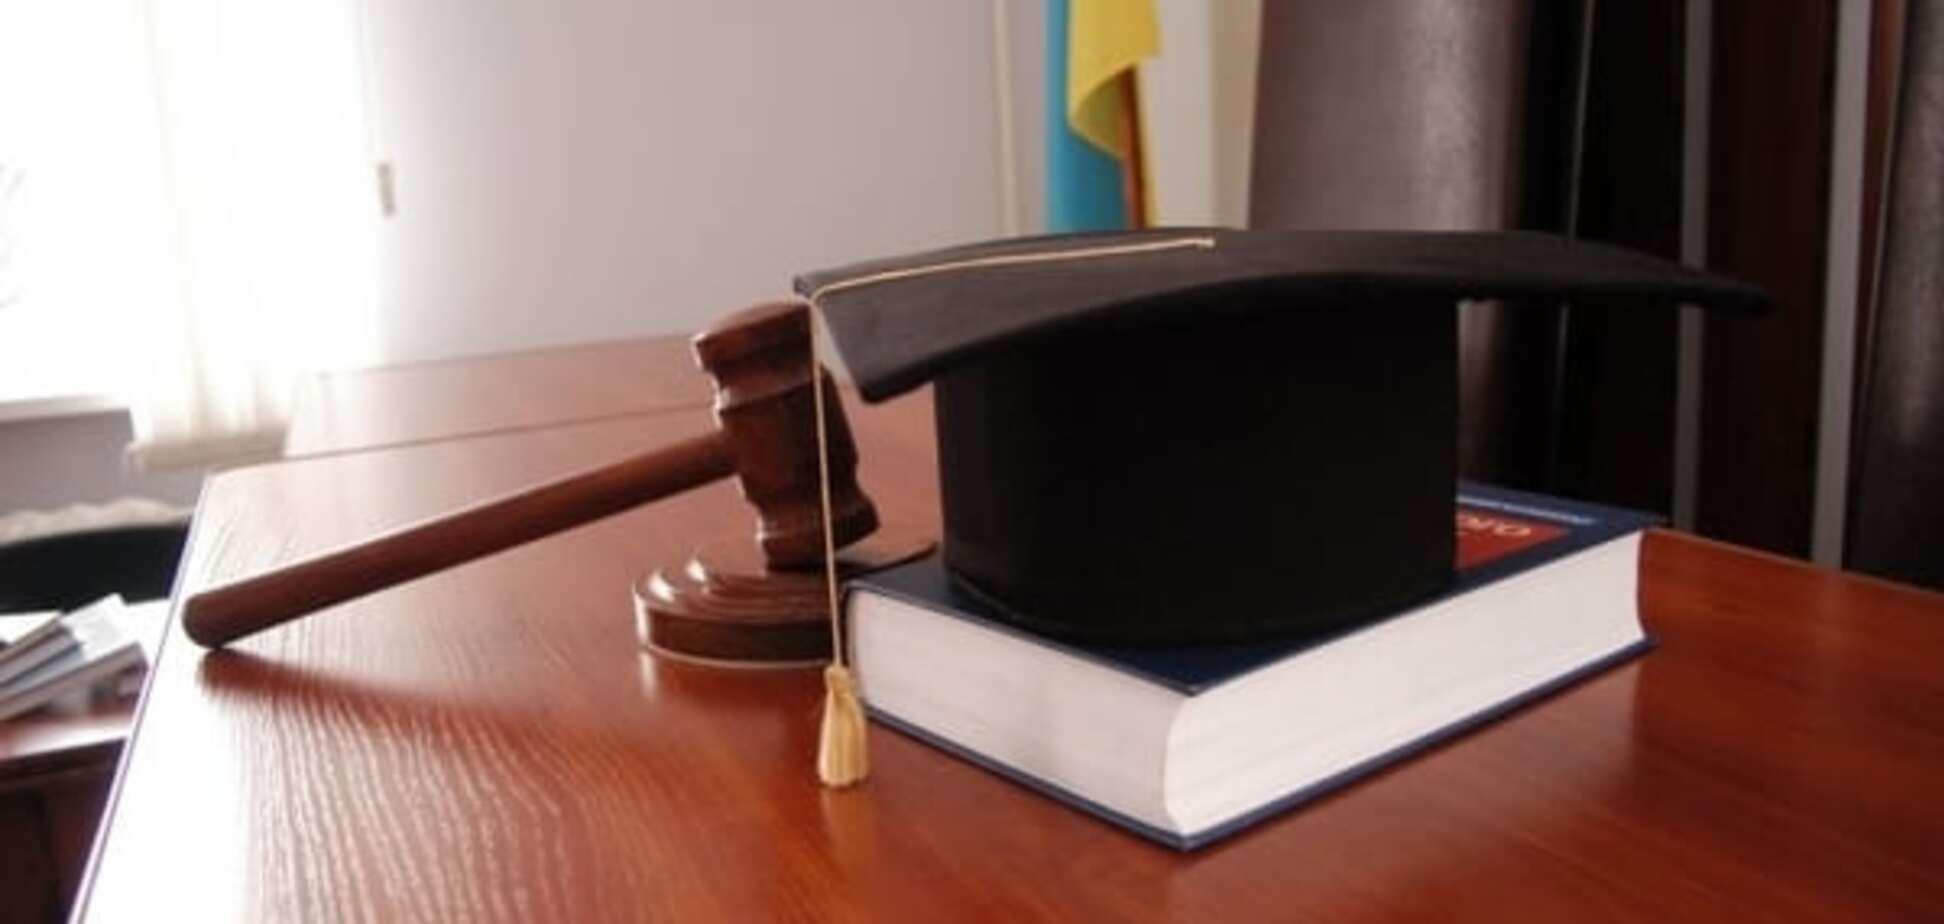 В Северодонецке у судьи при обыске нашли $63 тысячи